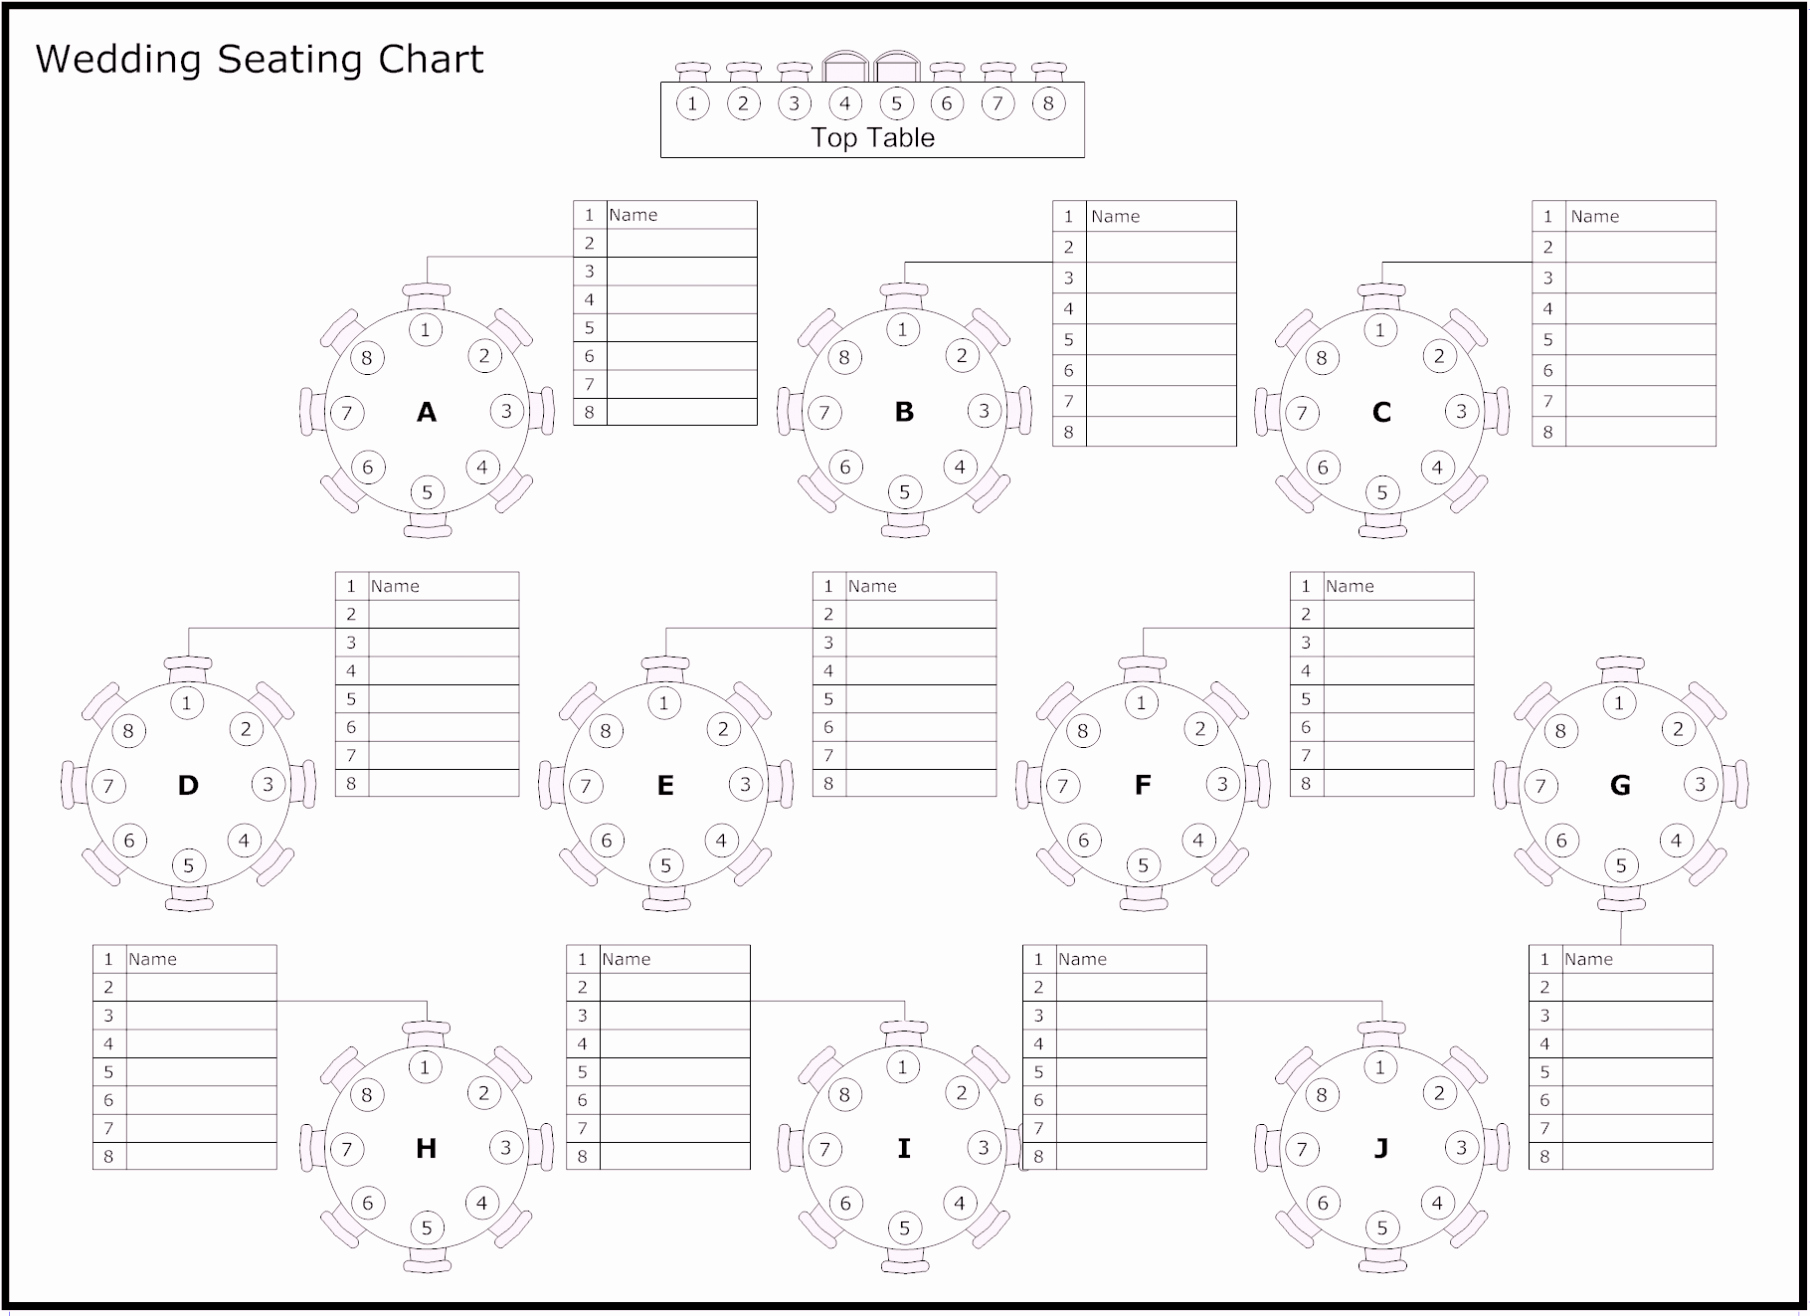 Wedding Seating Charts Templates Free New Free Table Of Reception & Wedding Seating Chart Template